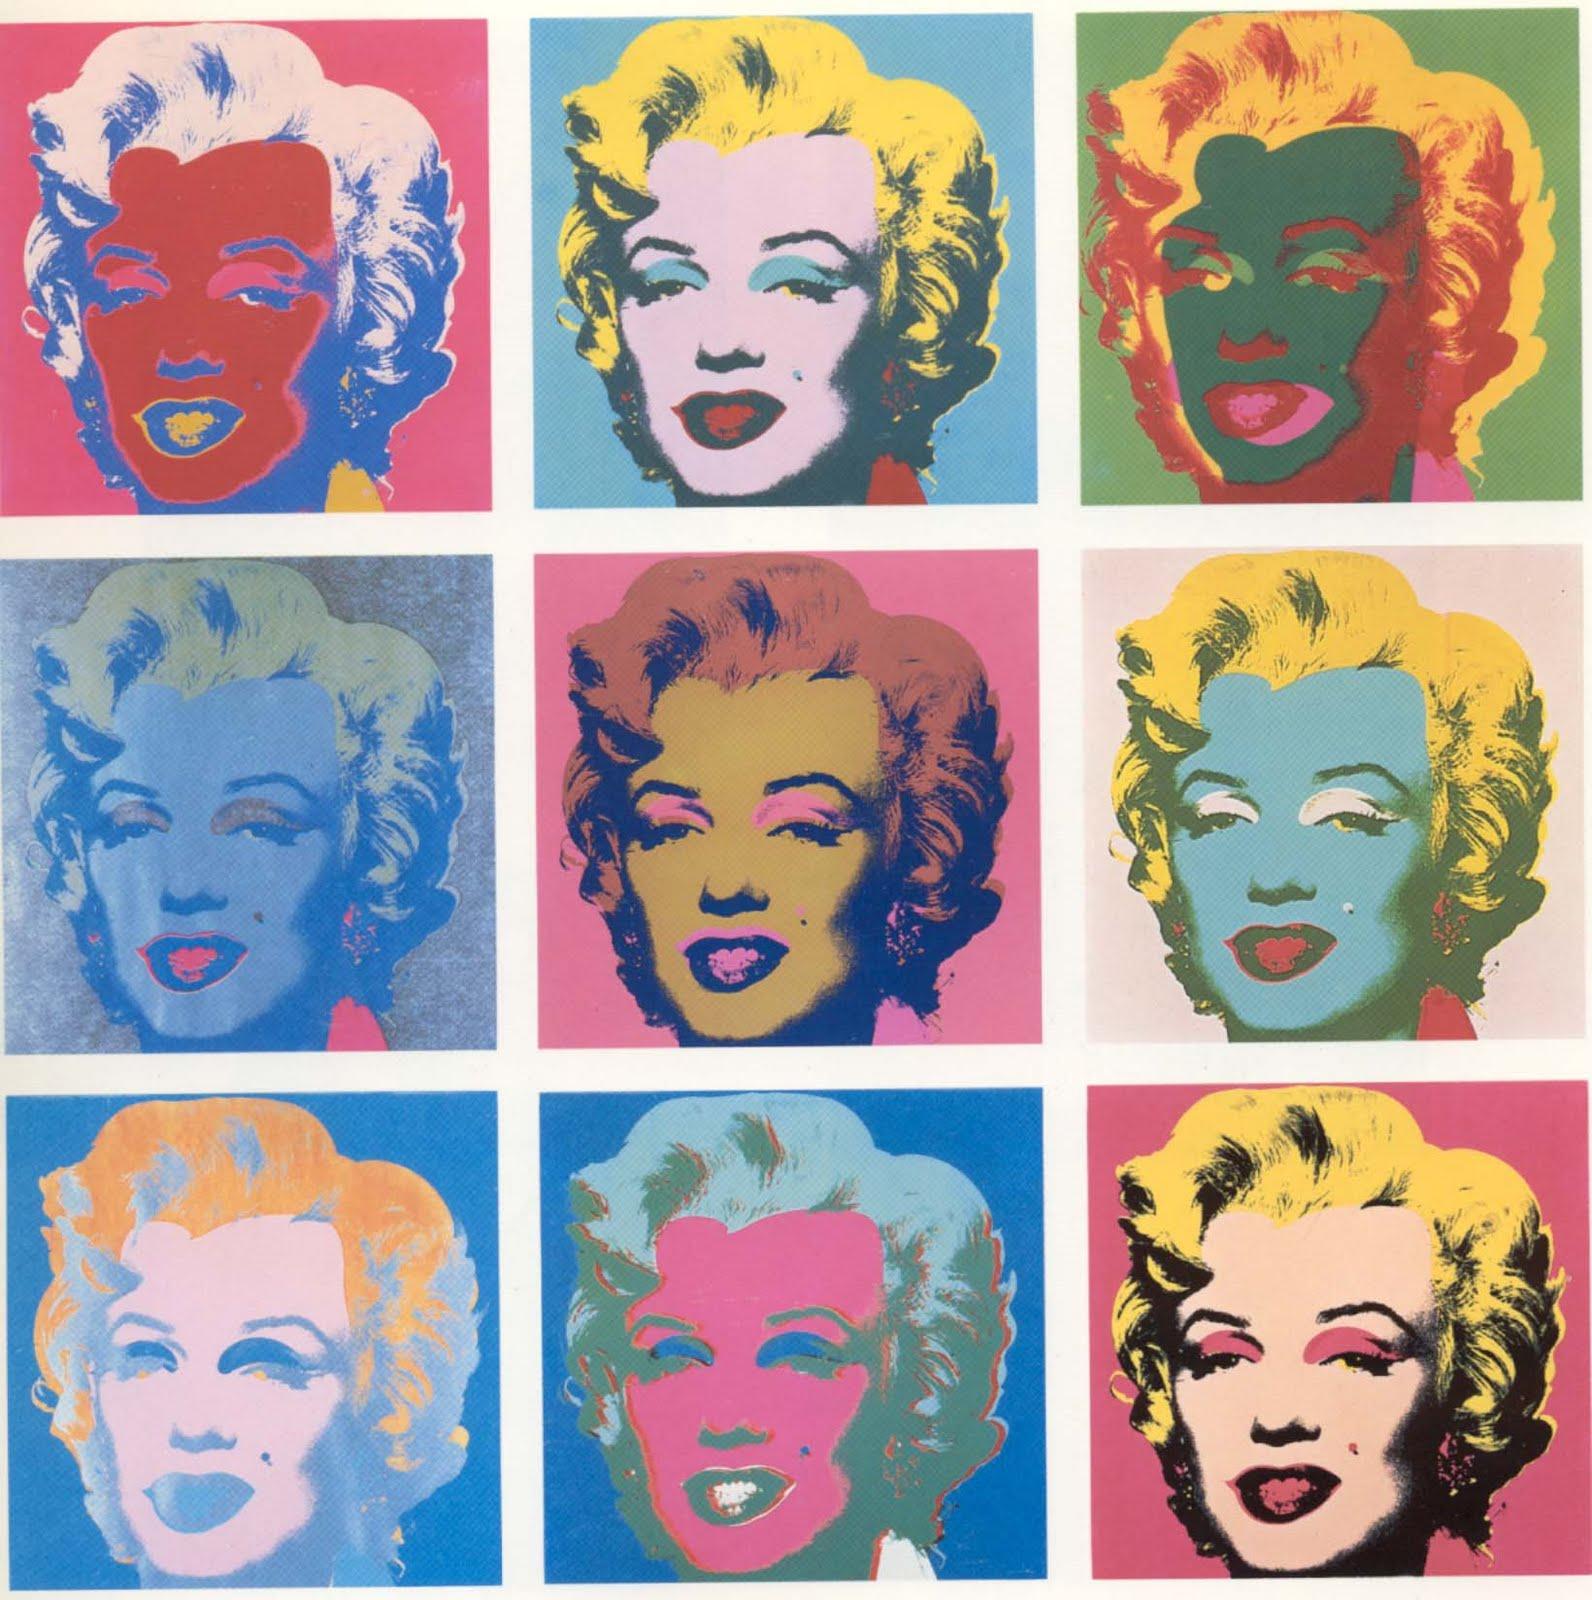 Retro Art Style Retro Style Andy Warhol Art